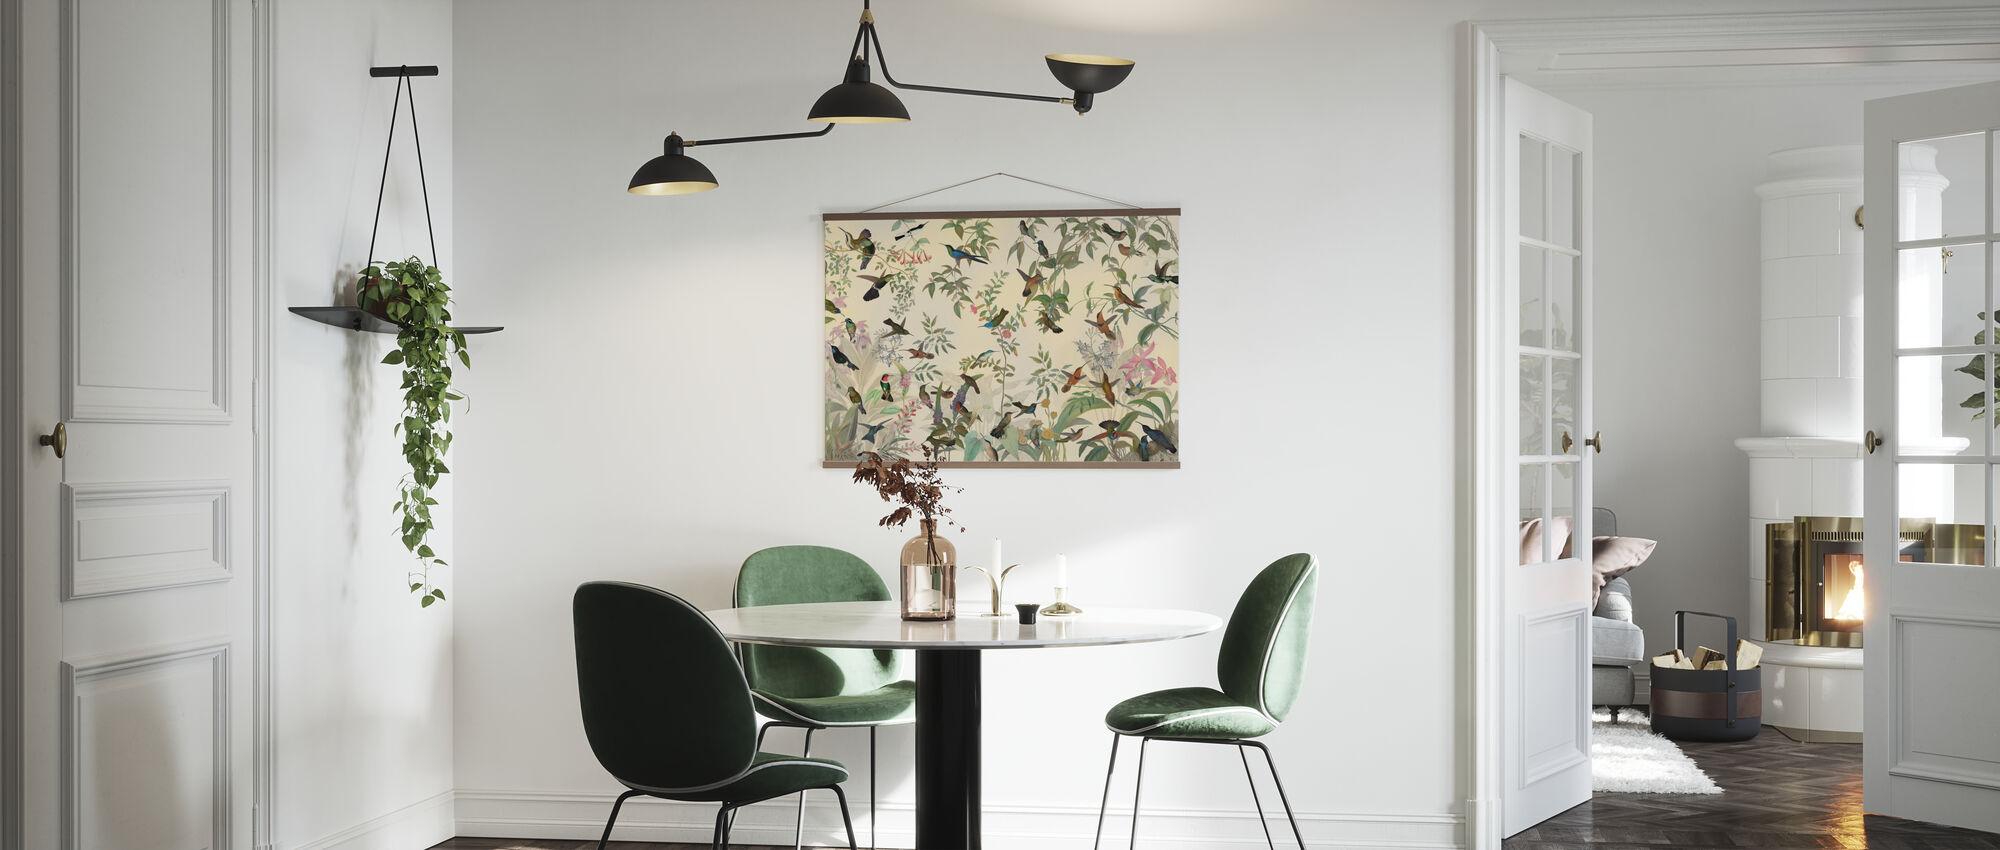 Vogels symfonie - Poster - Keuken